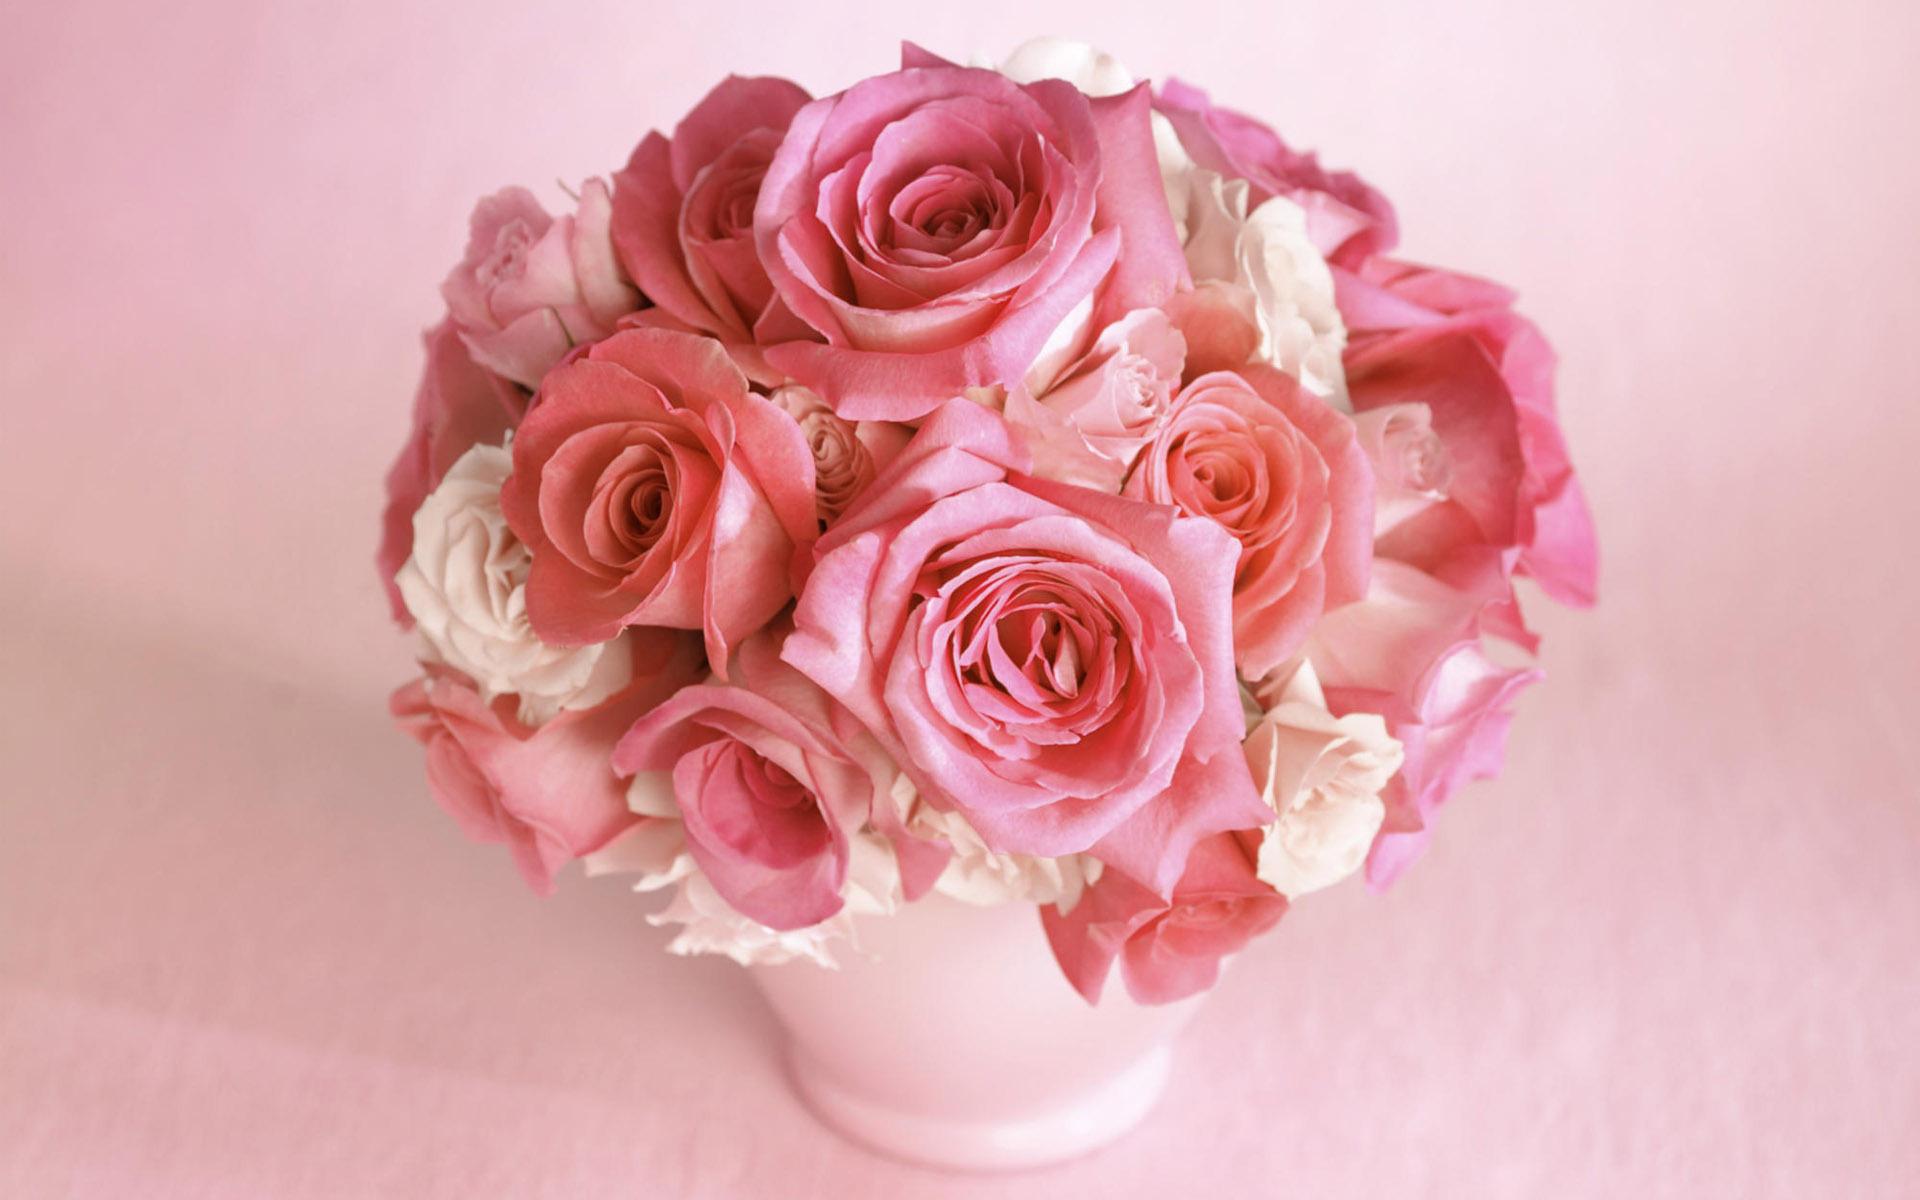 цветы, розовый, Цветок, букет, роза, цвет, розы